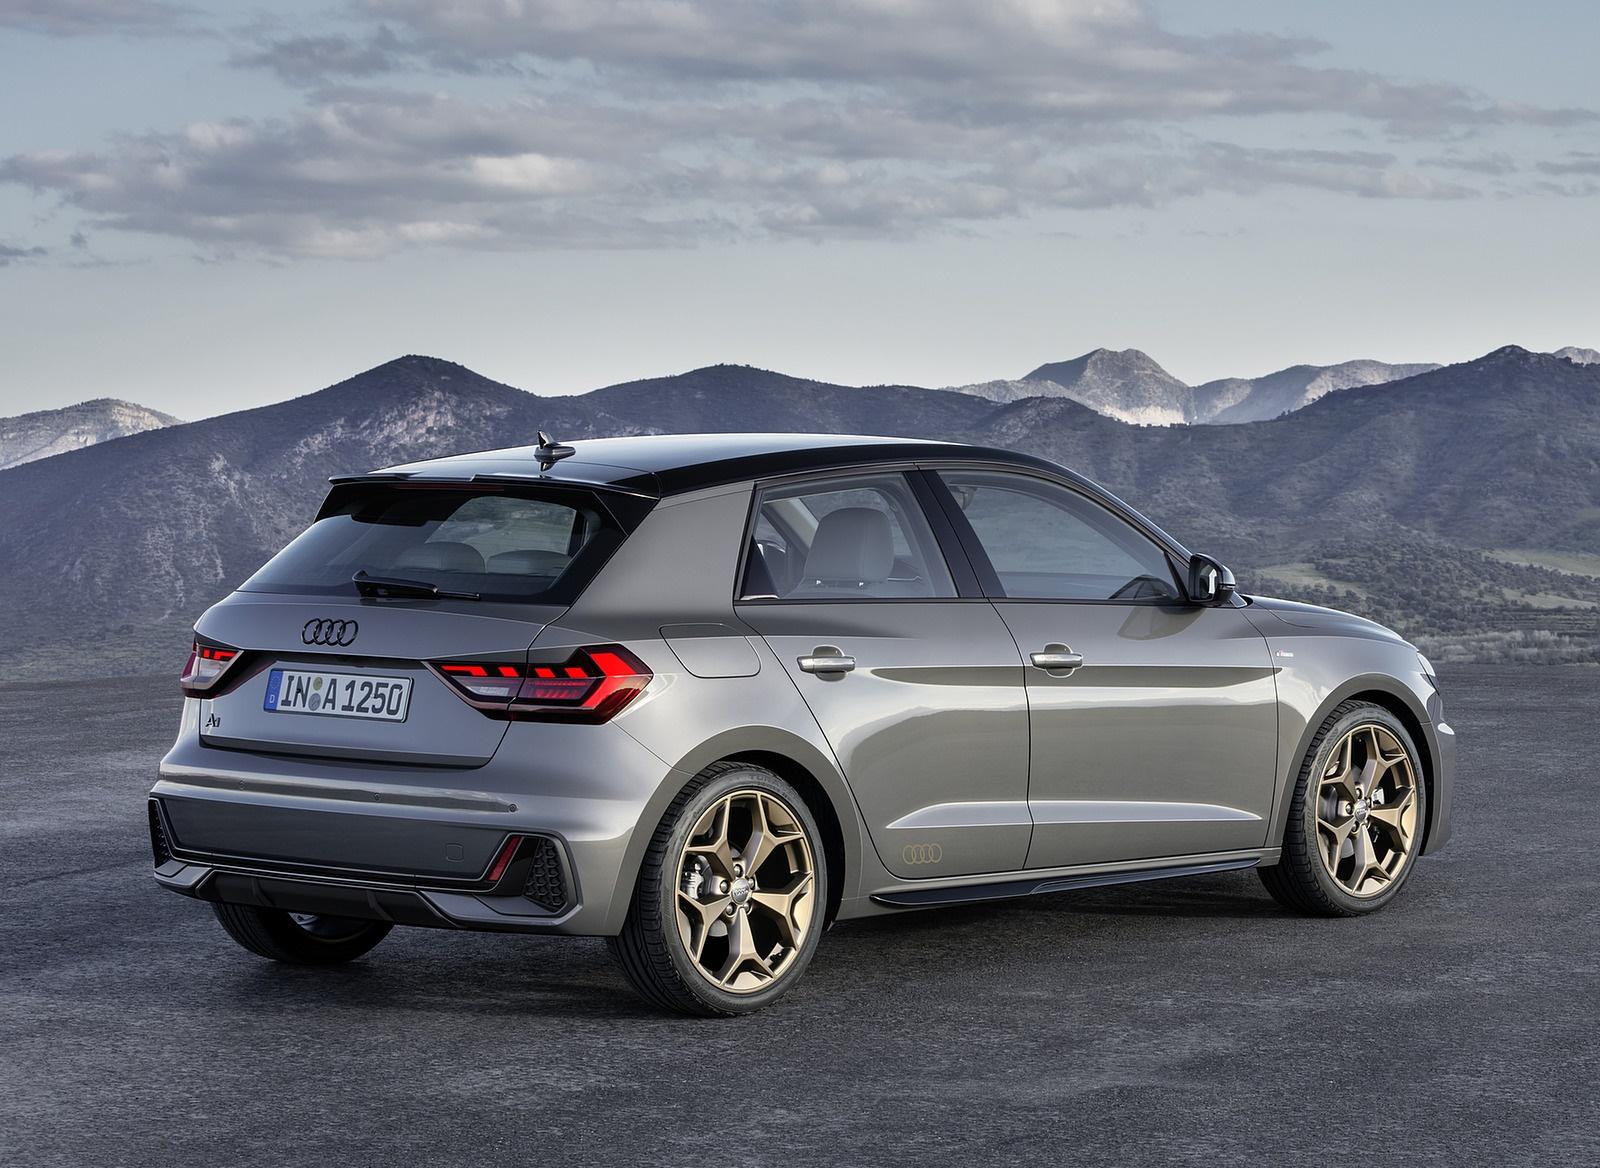 2019 Audi A1 Sportback (Color: Chronos Grey) Rear Three-Quarter Wallpapers (10)